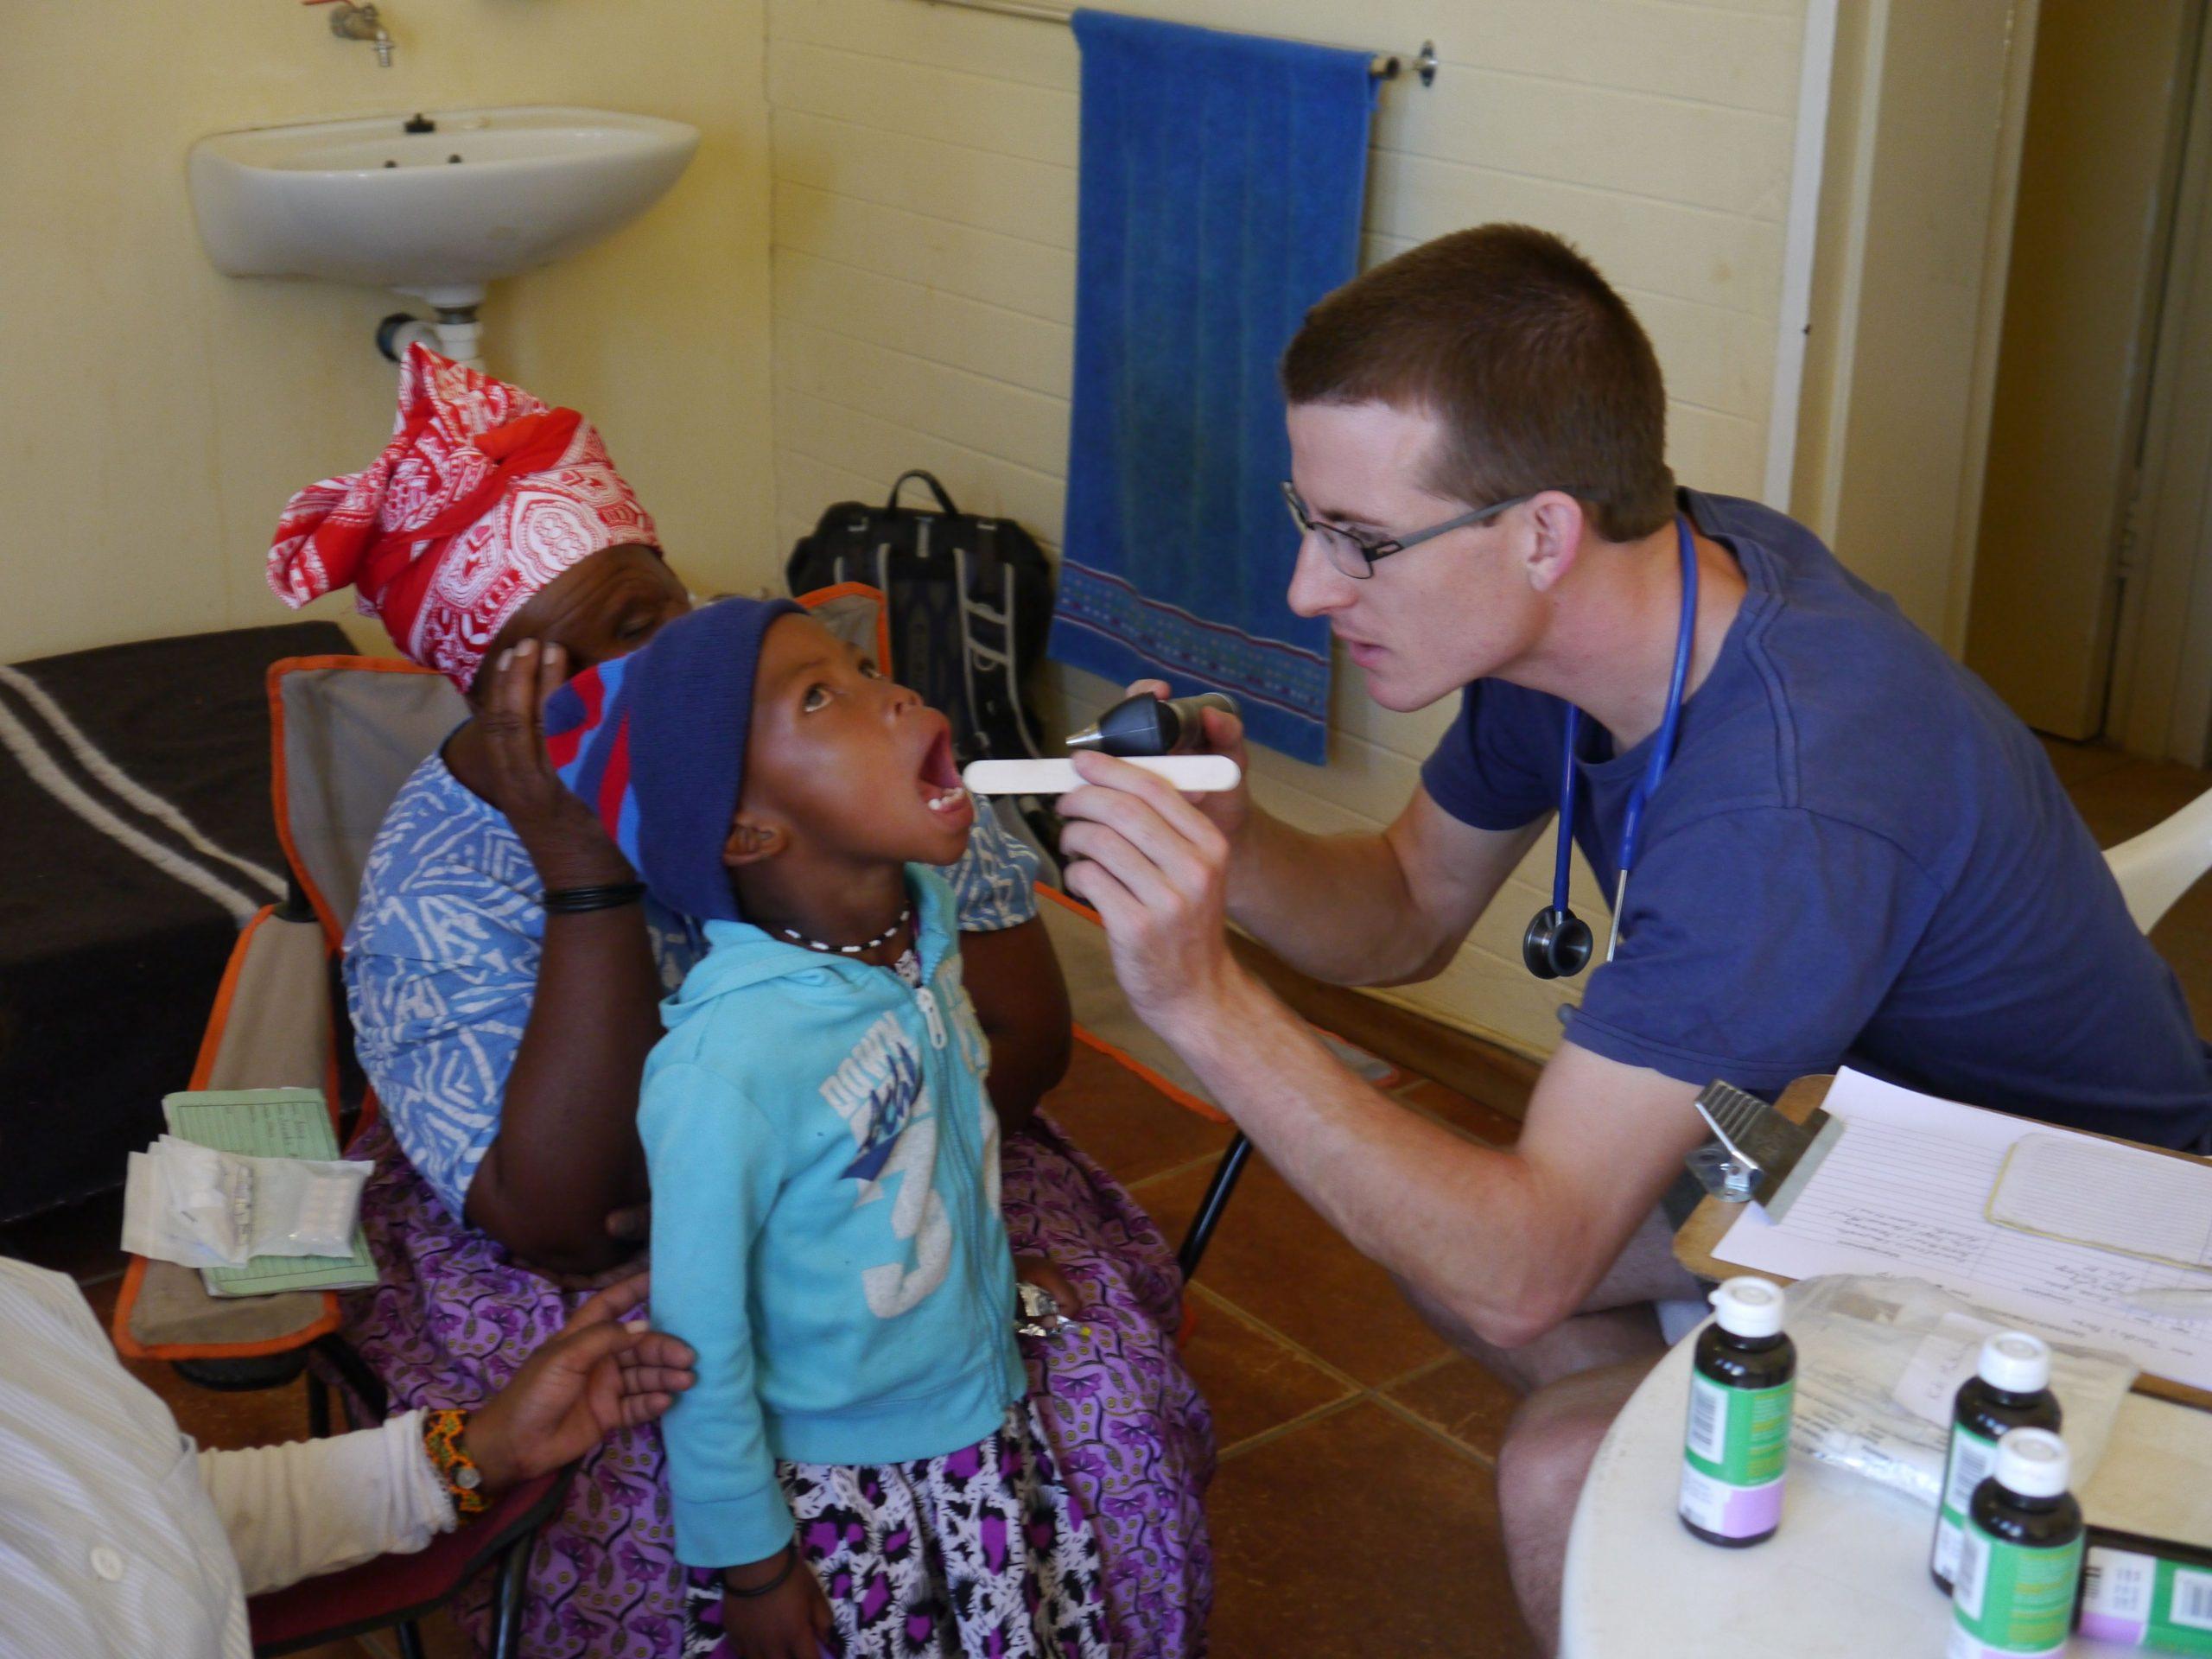 Medical check on child